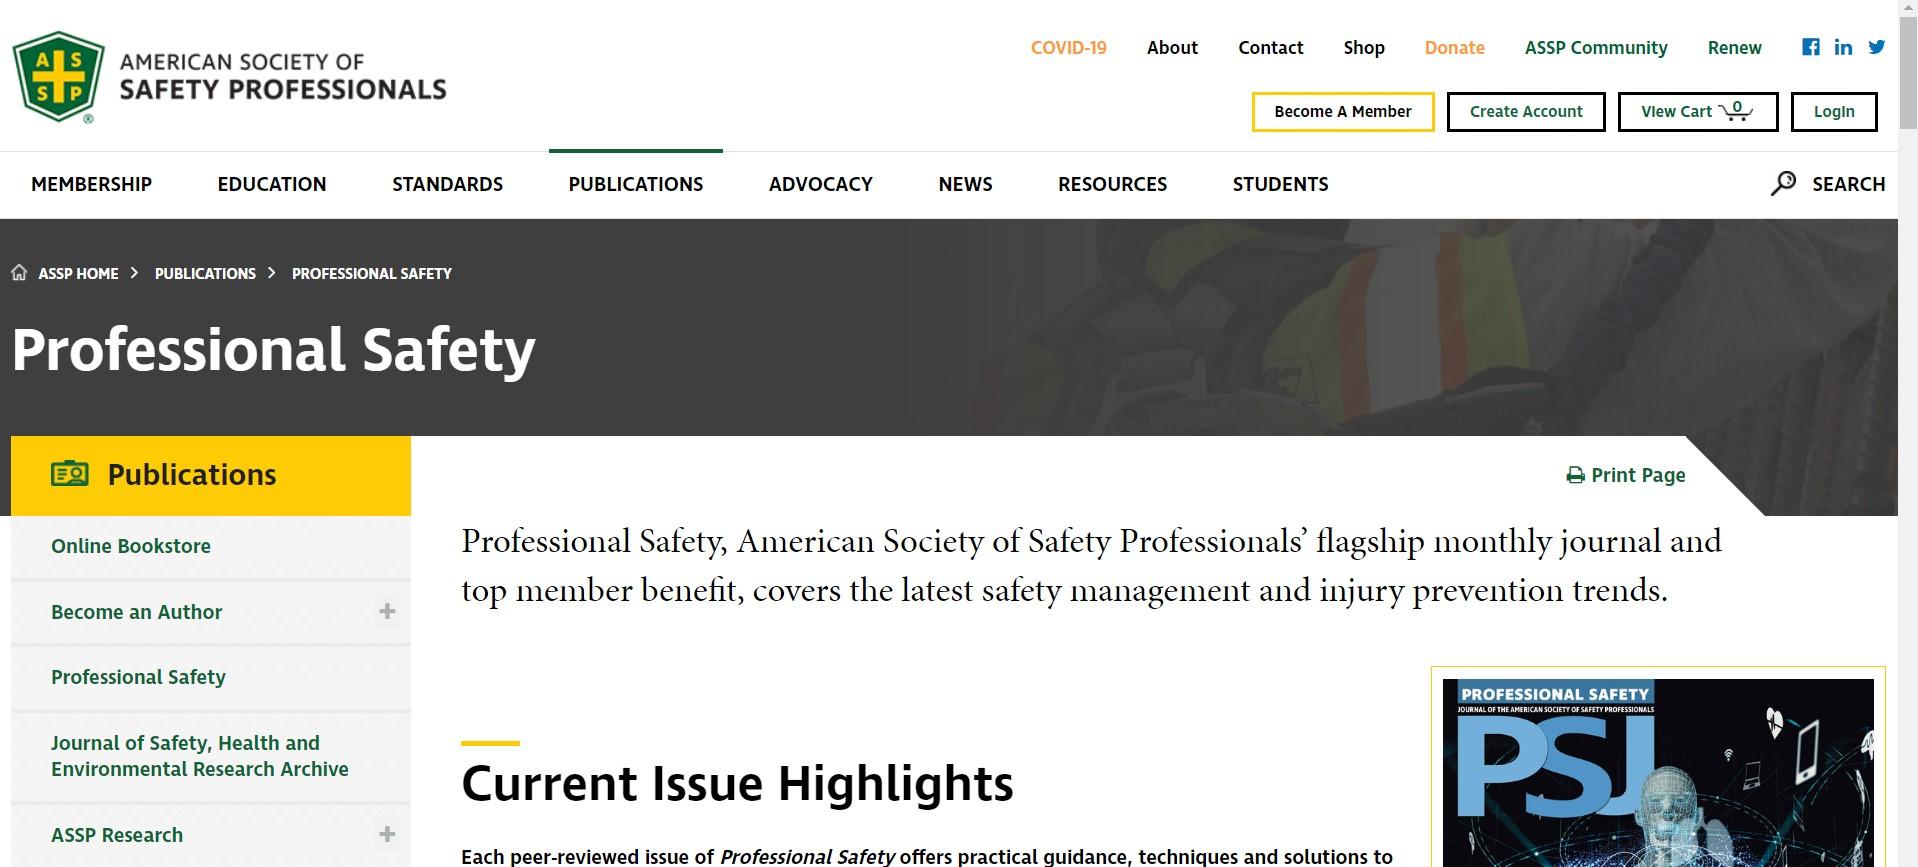 http://ccgsia.com/uploads/safety_resources/ASSP_site.JPG